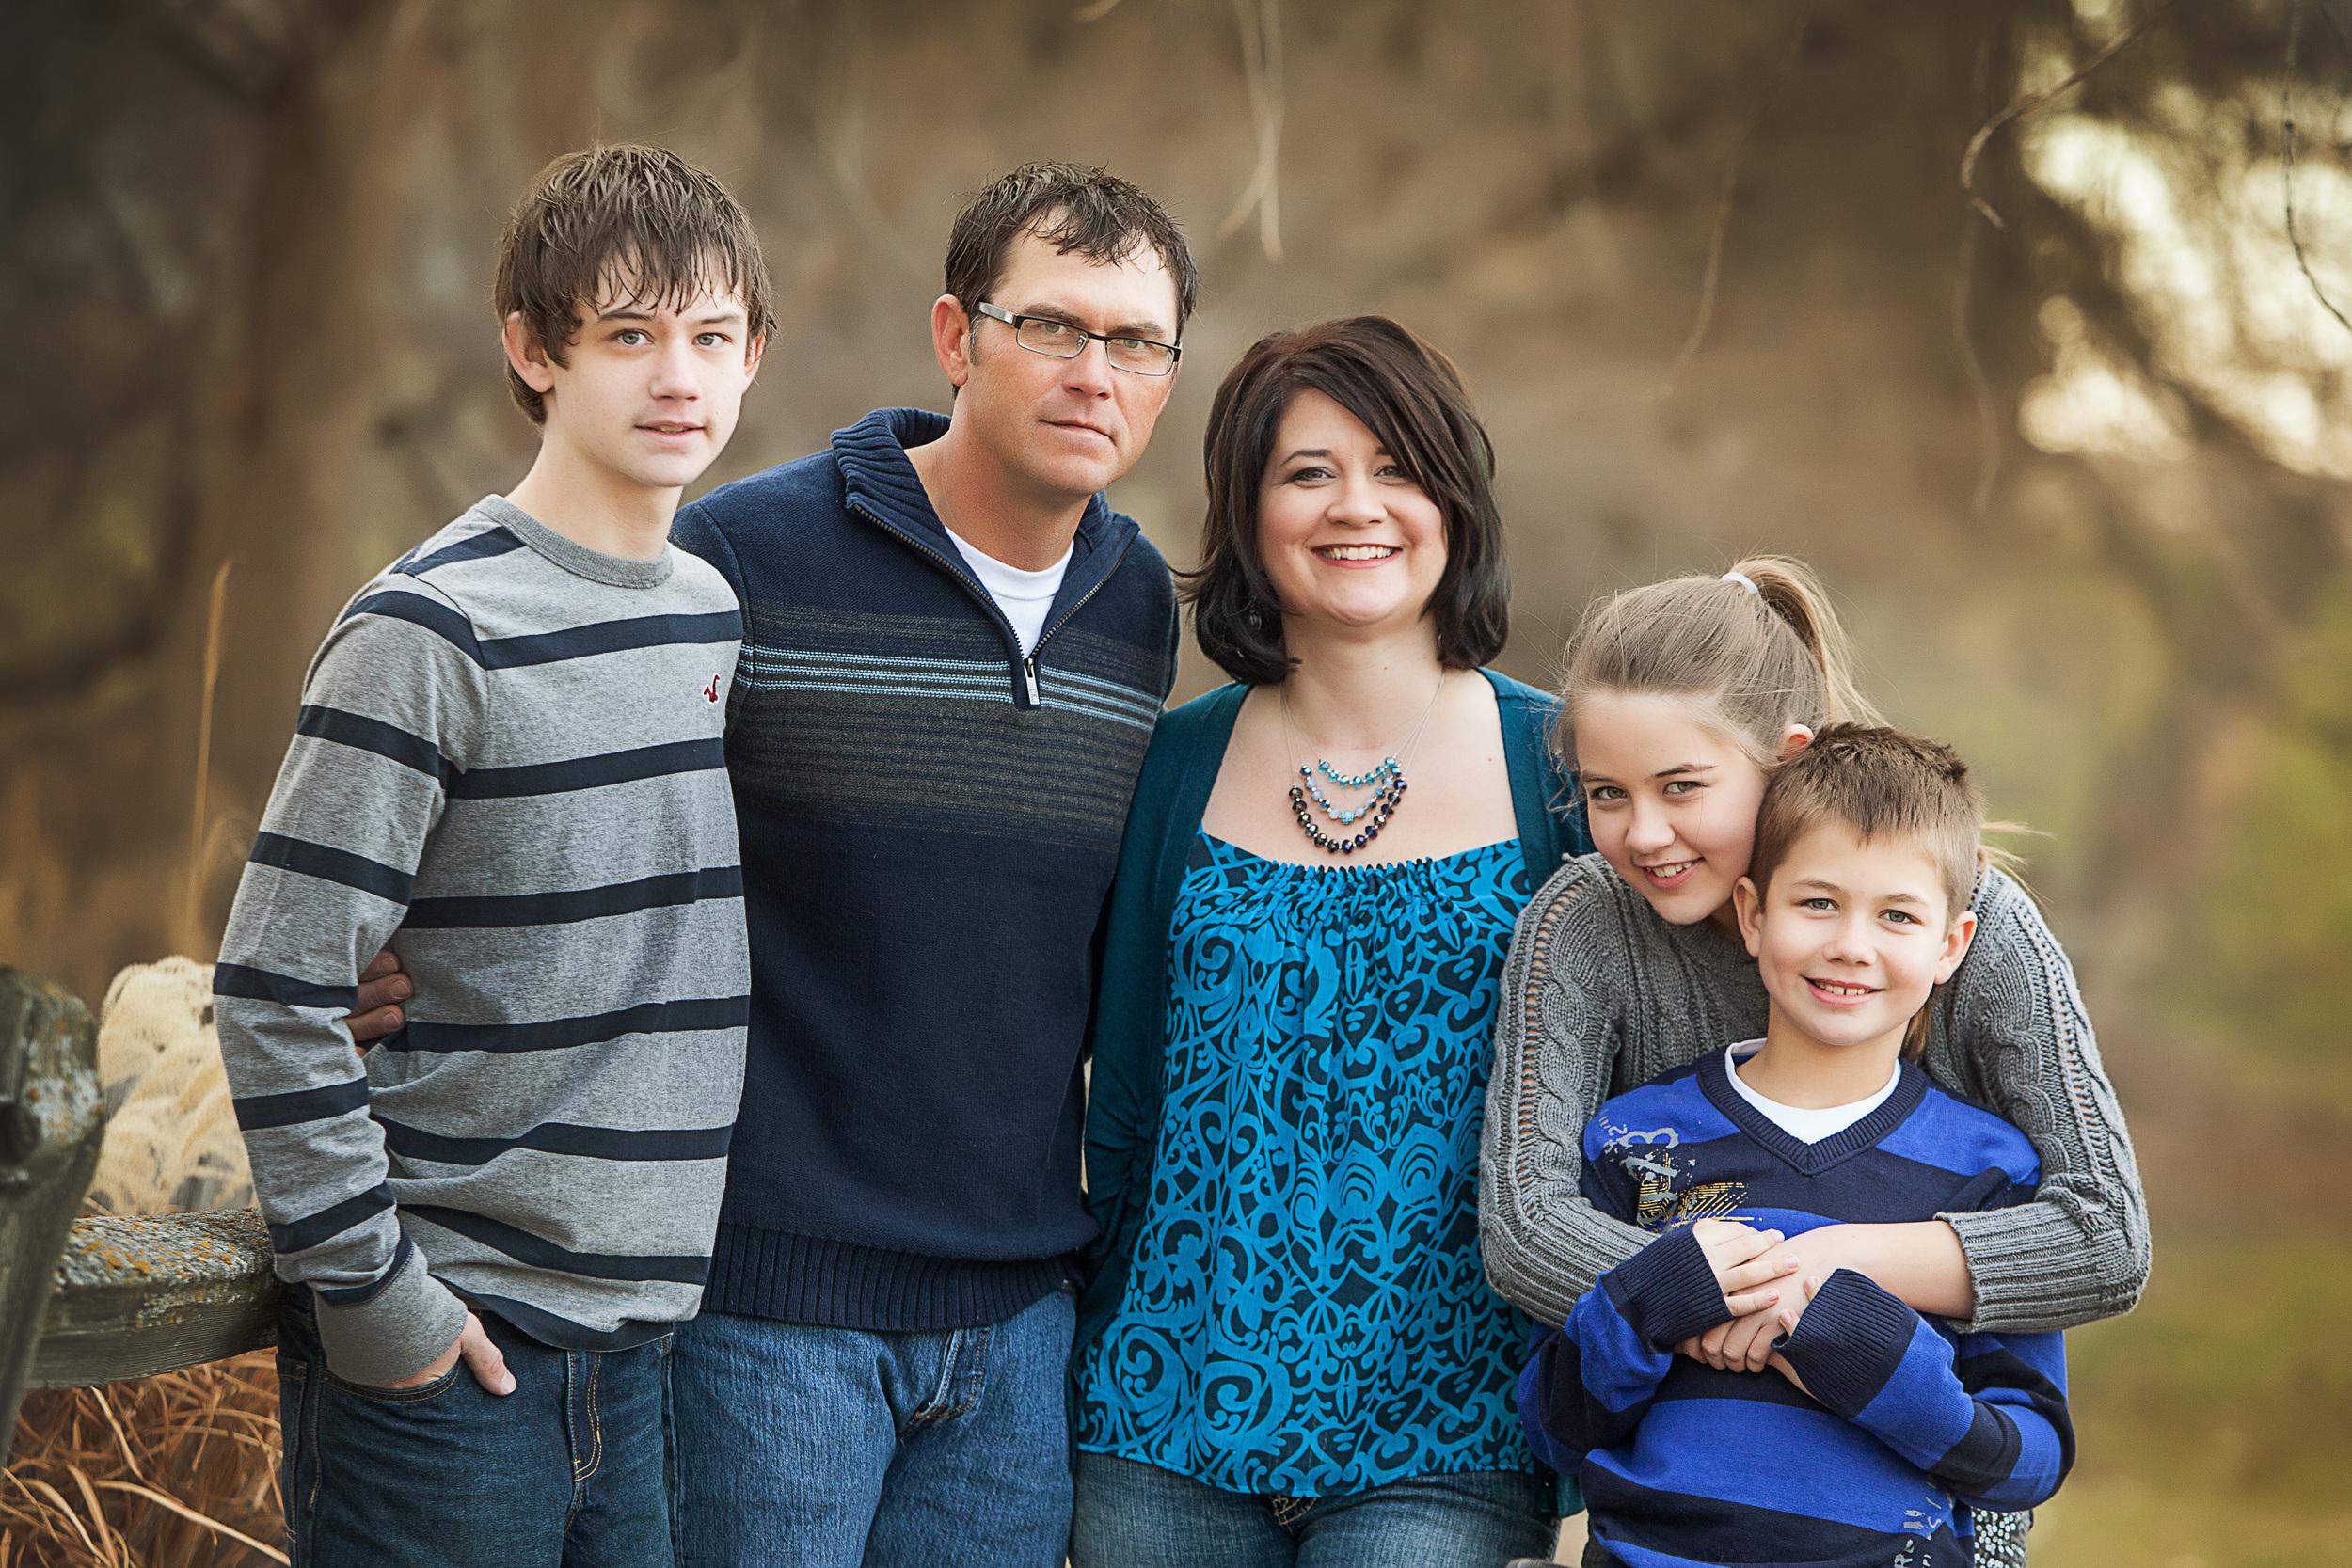 family_portrait_sioux_falls_Shalista0010.jpg